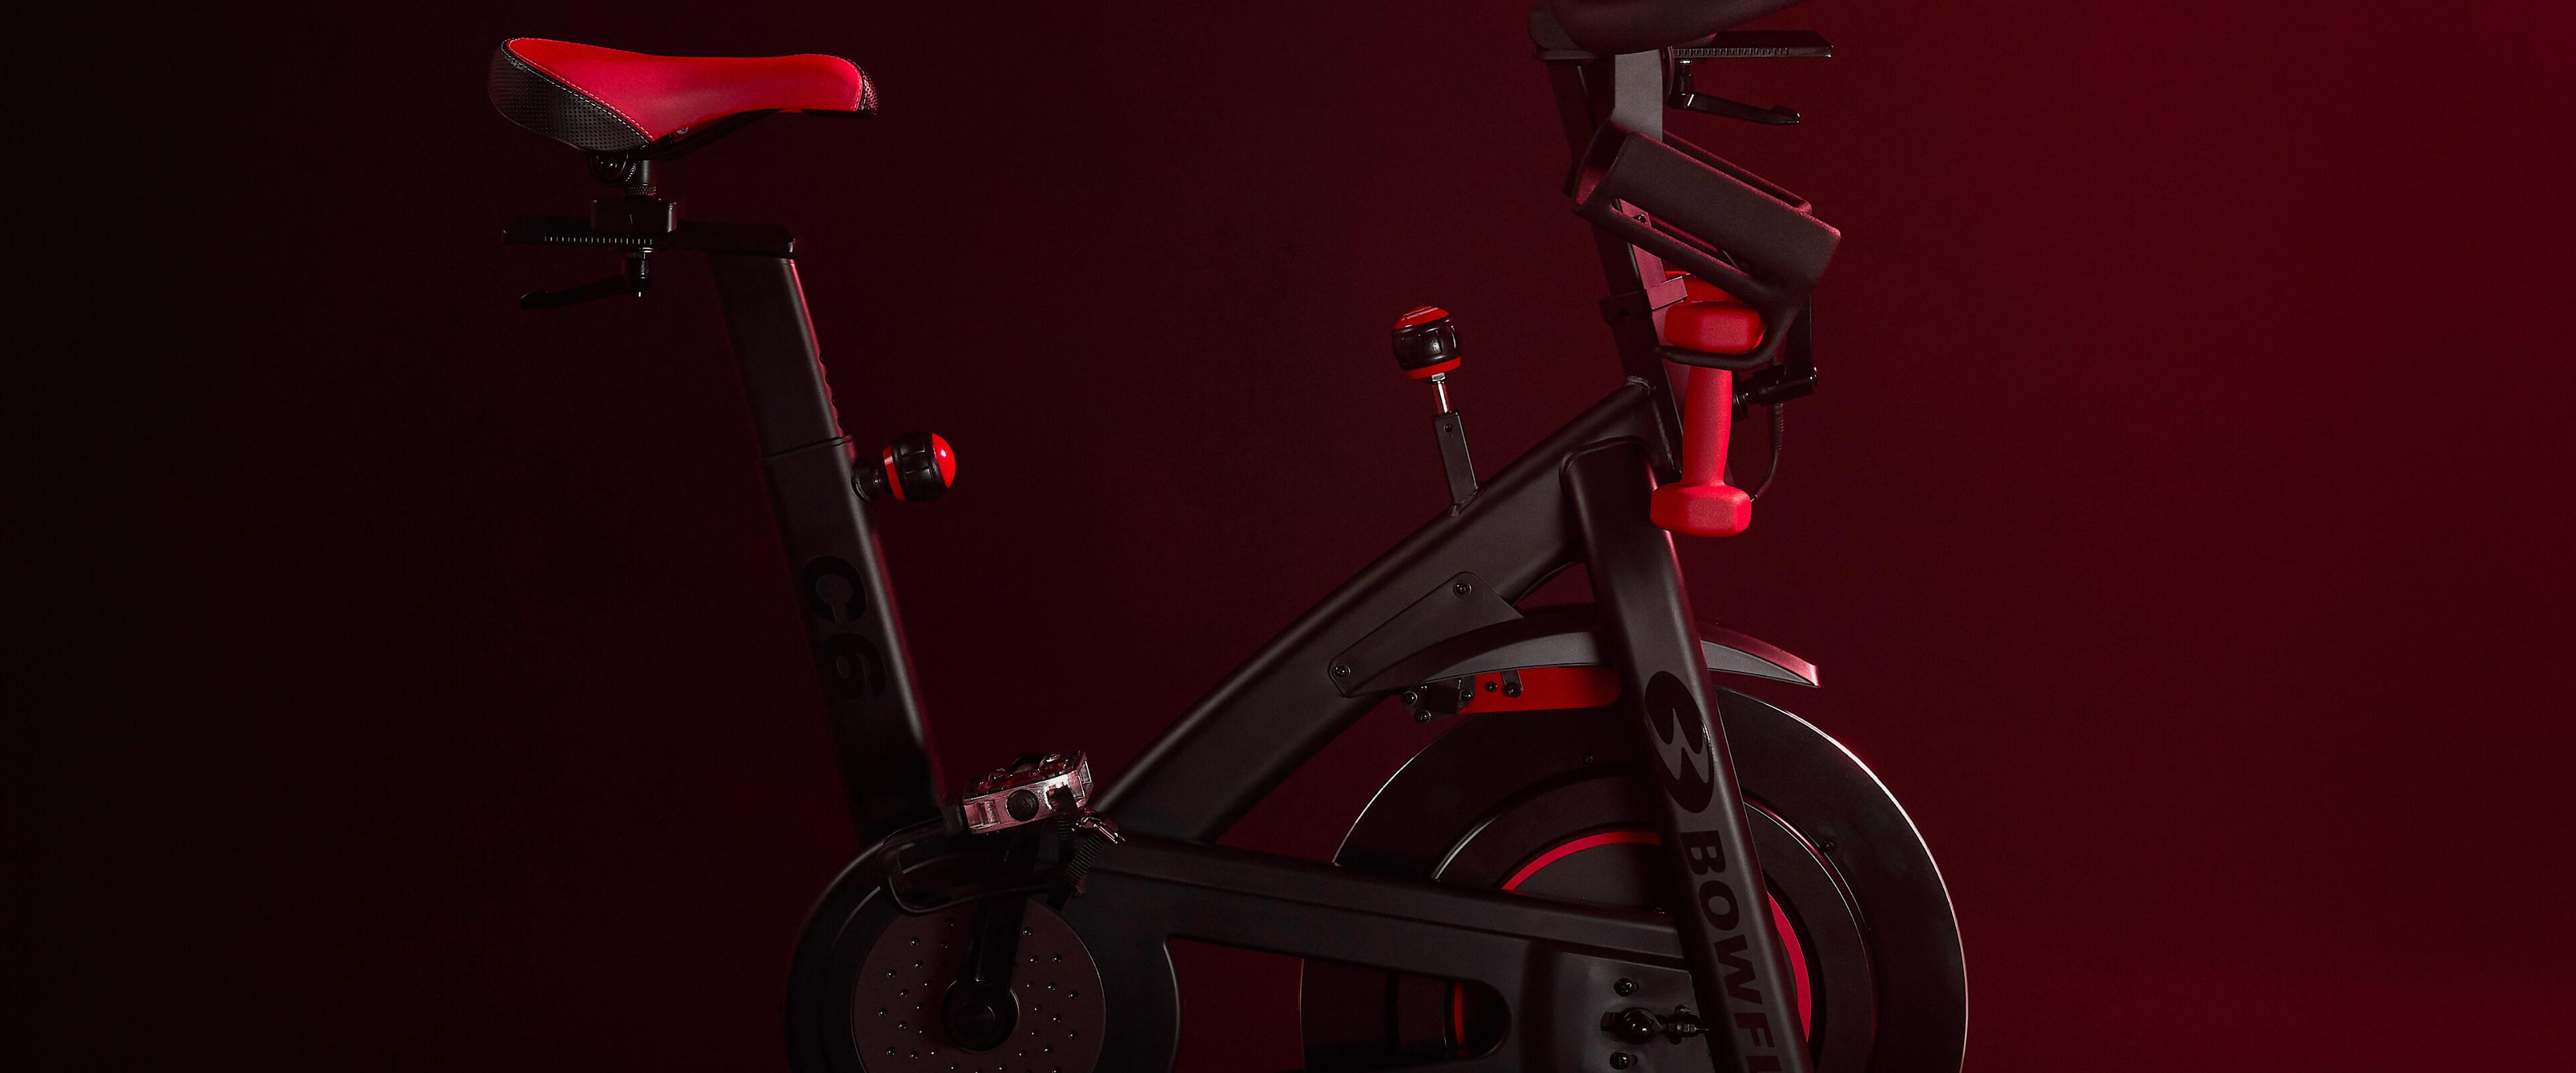 A Bowflex C6 Bike